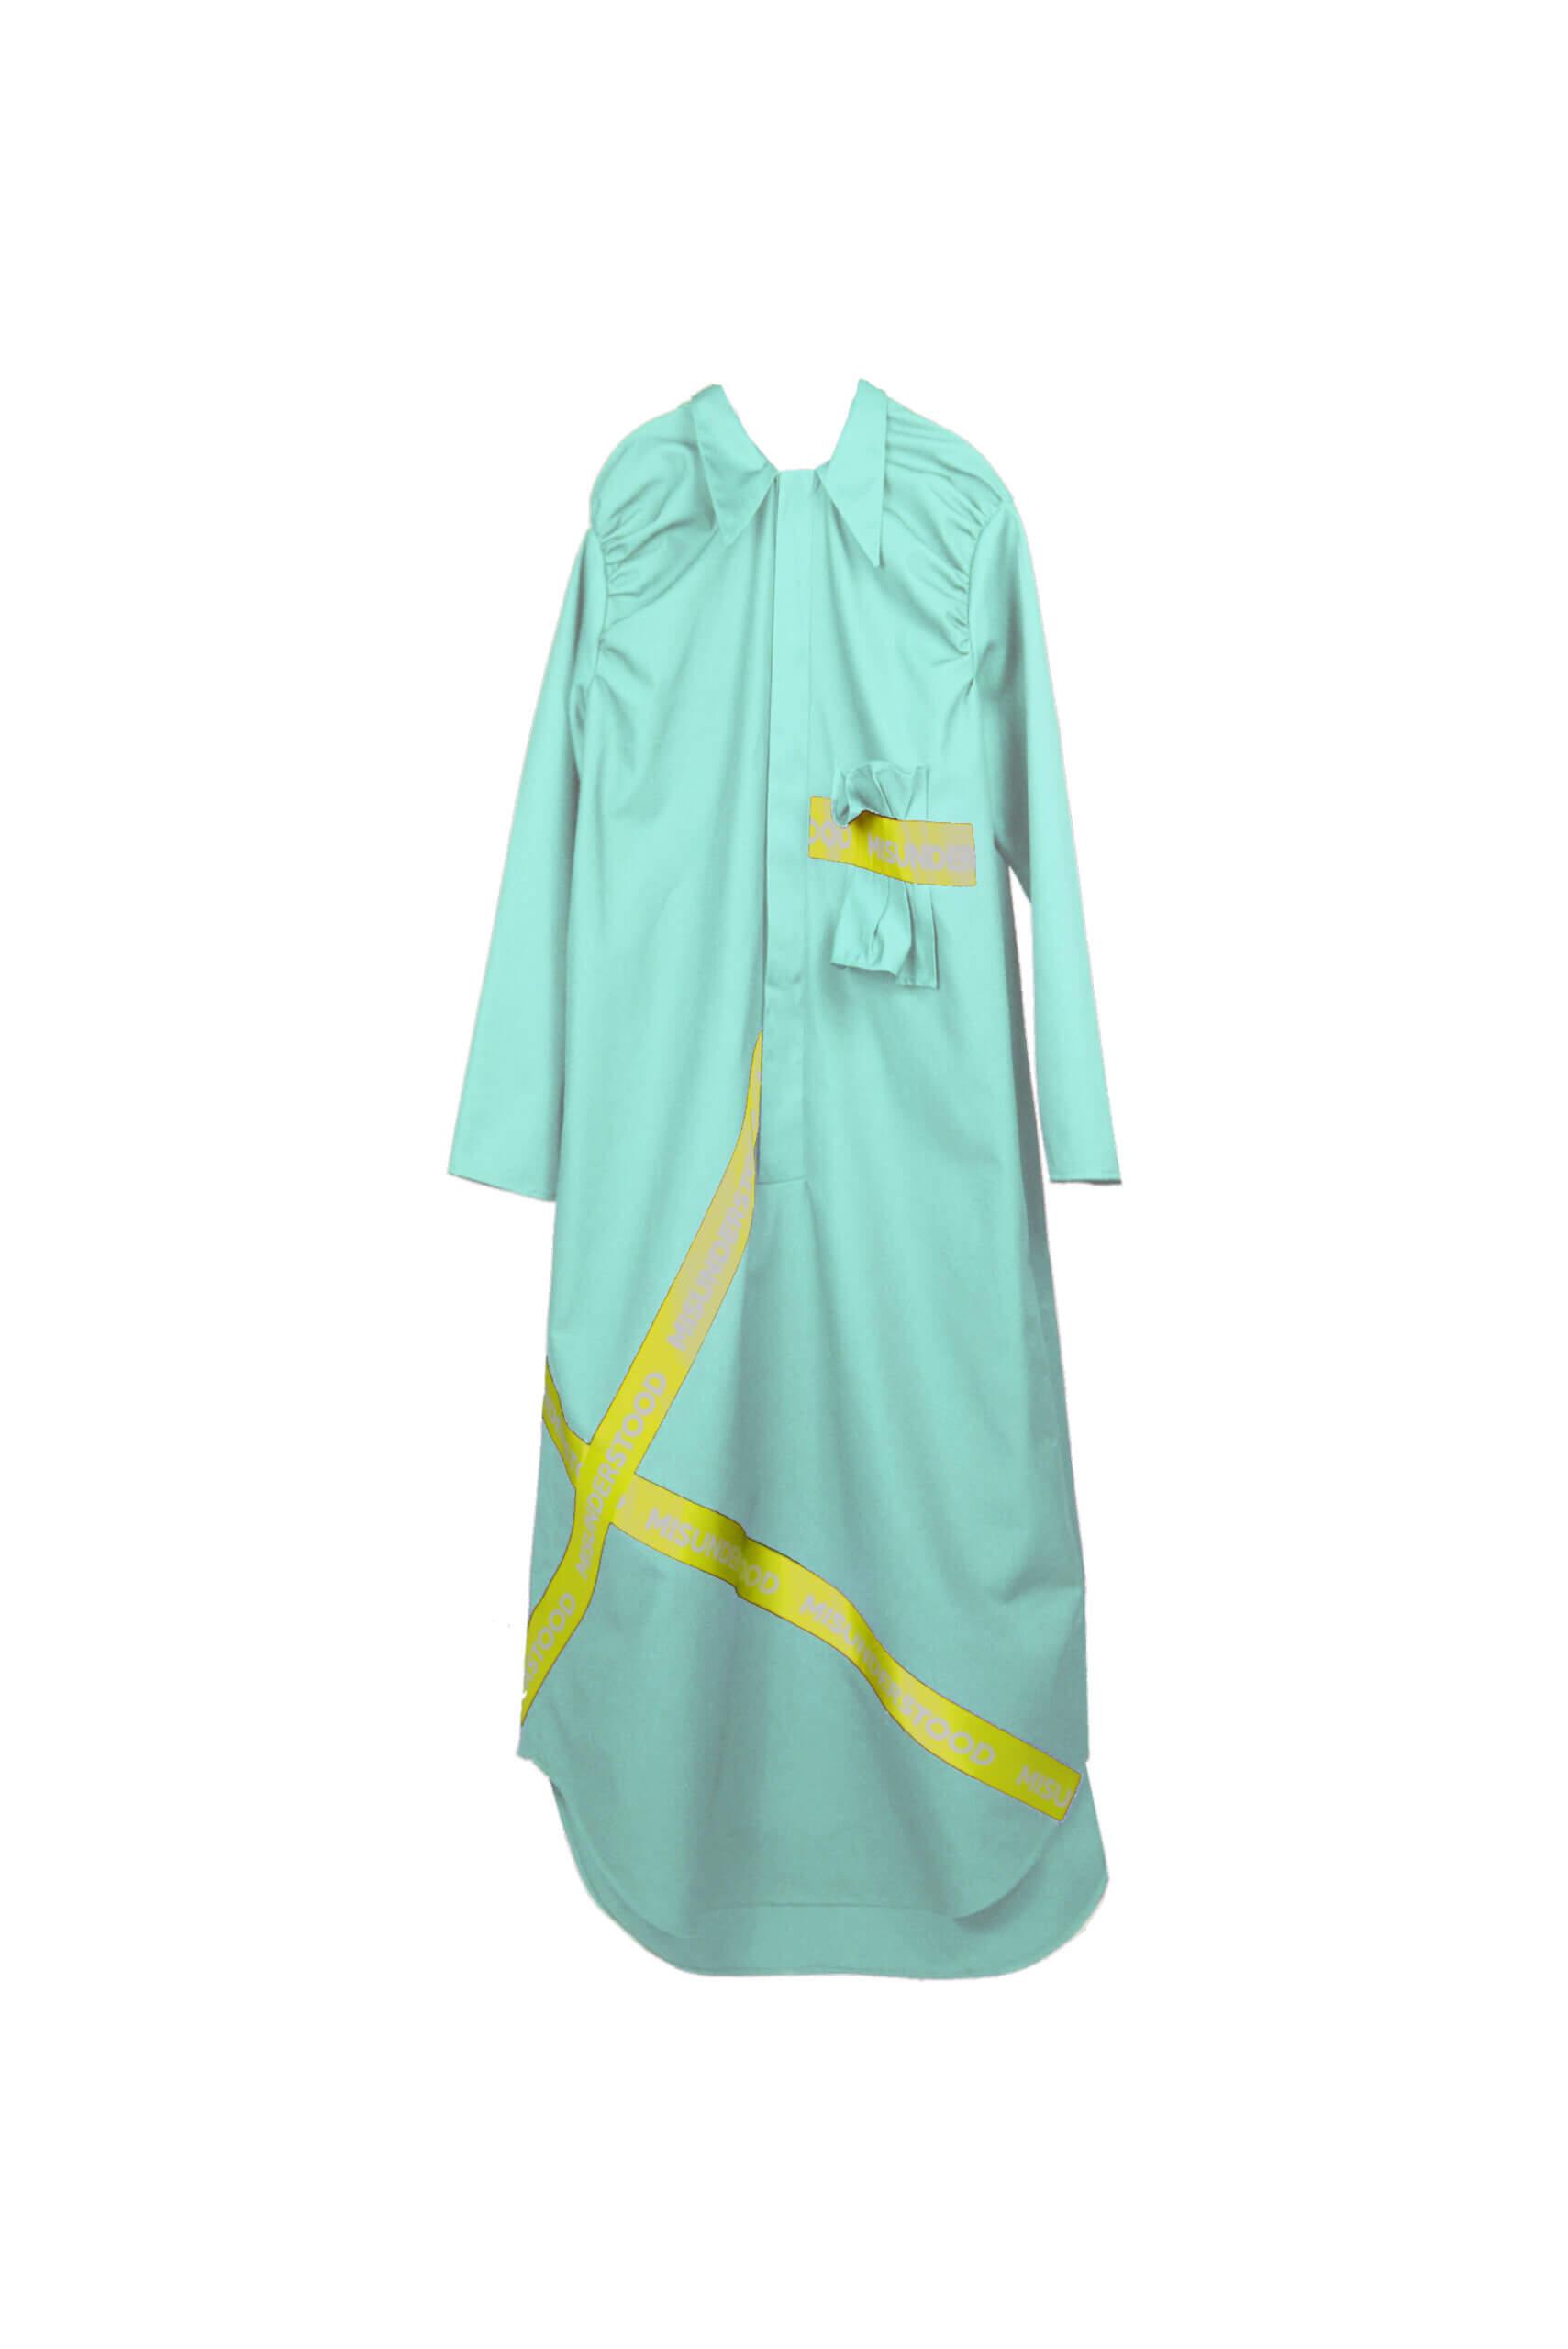 front dress blue